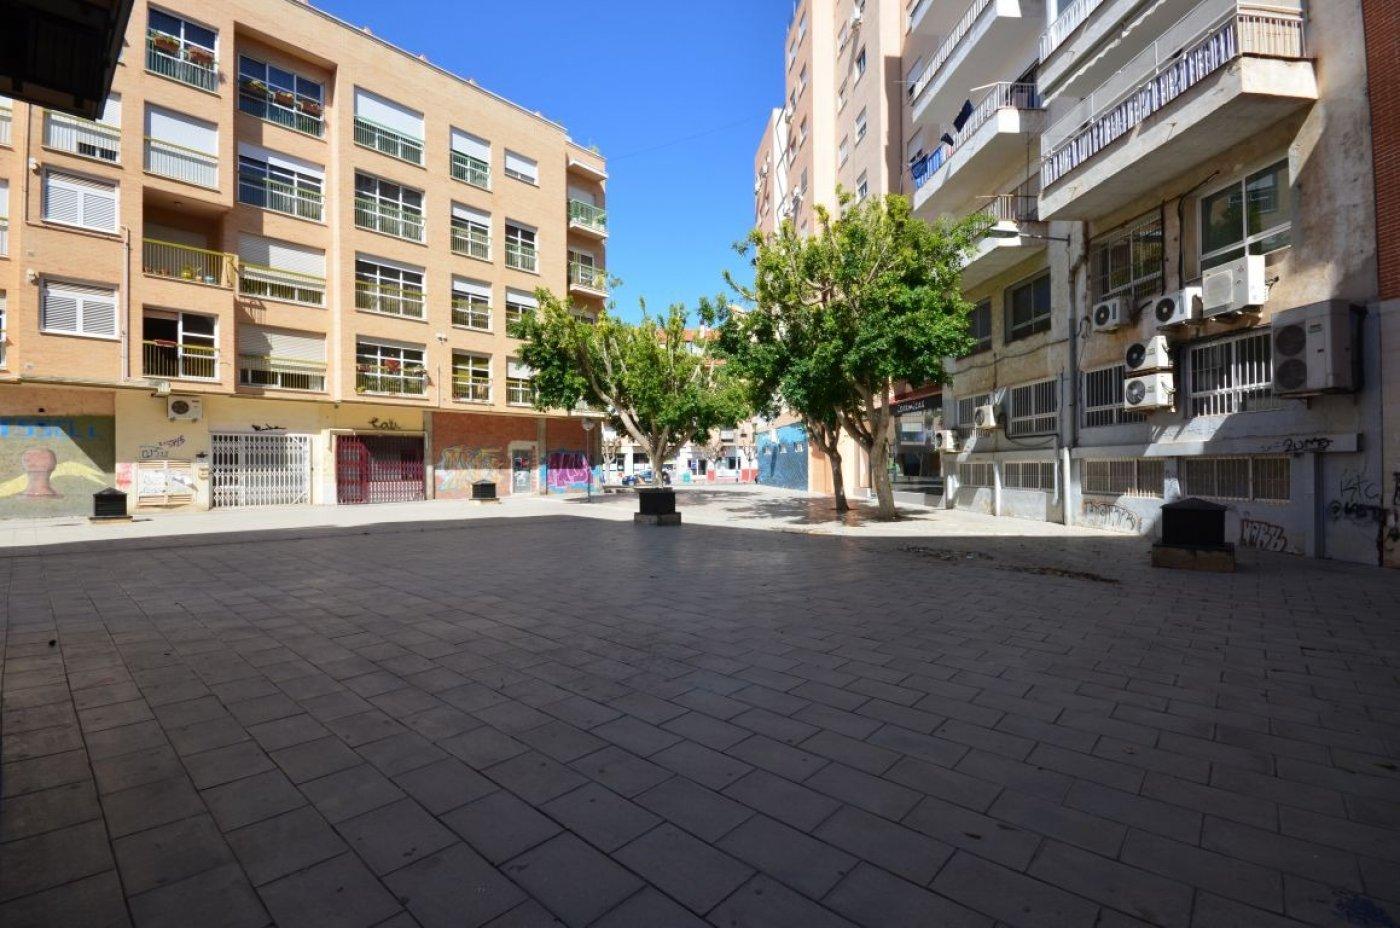 Local comercial buen estado en alquiler en Murcia, Centro